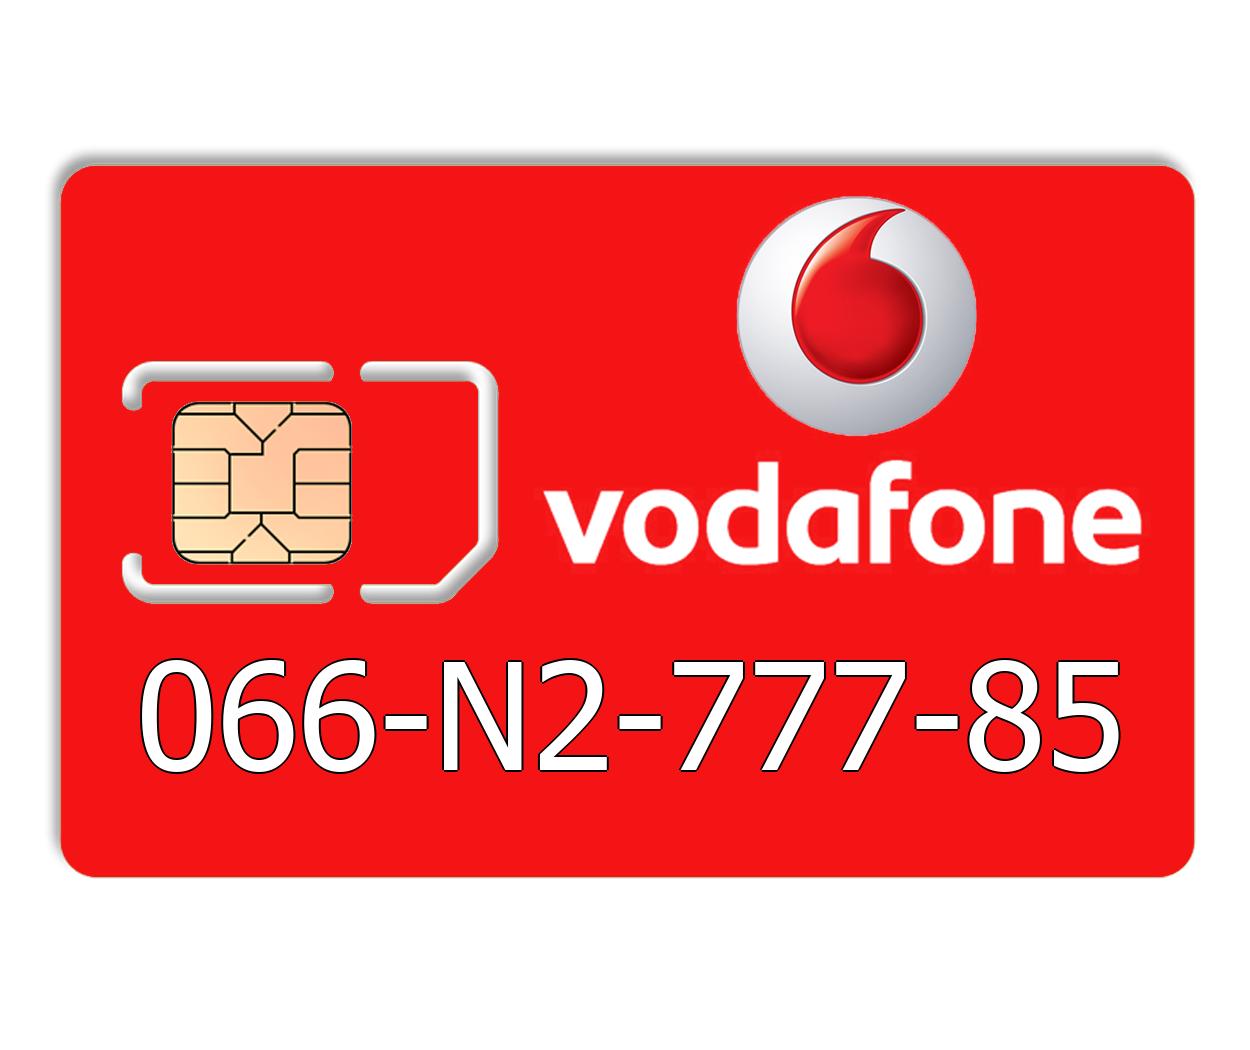 Красивый номер Vodafone 066-N2-777-85